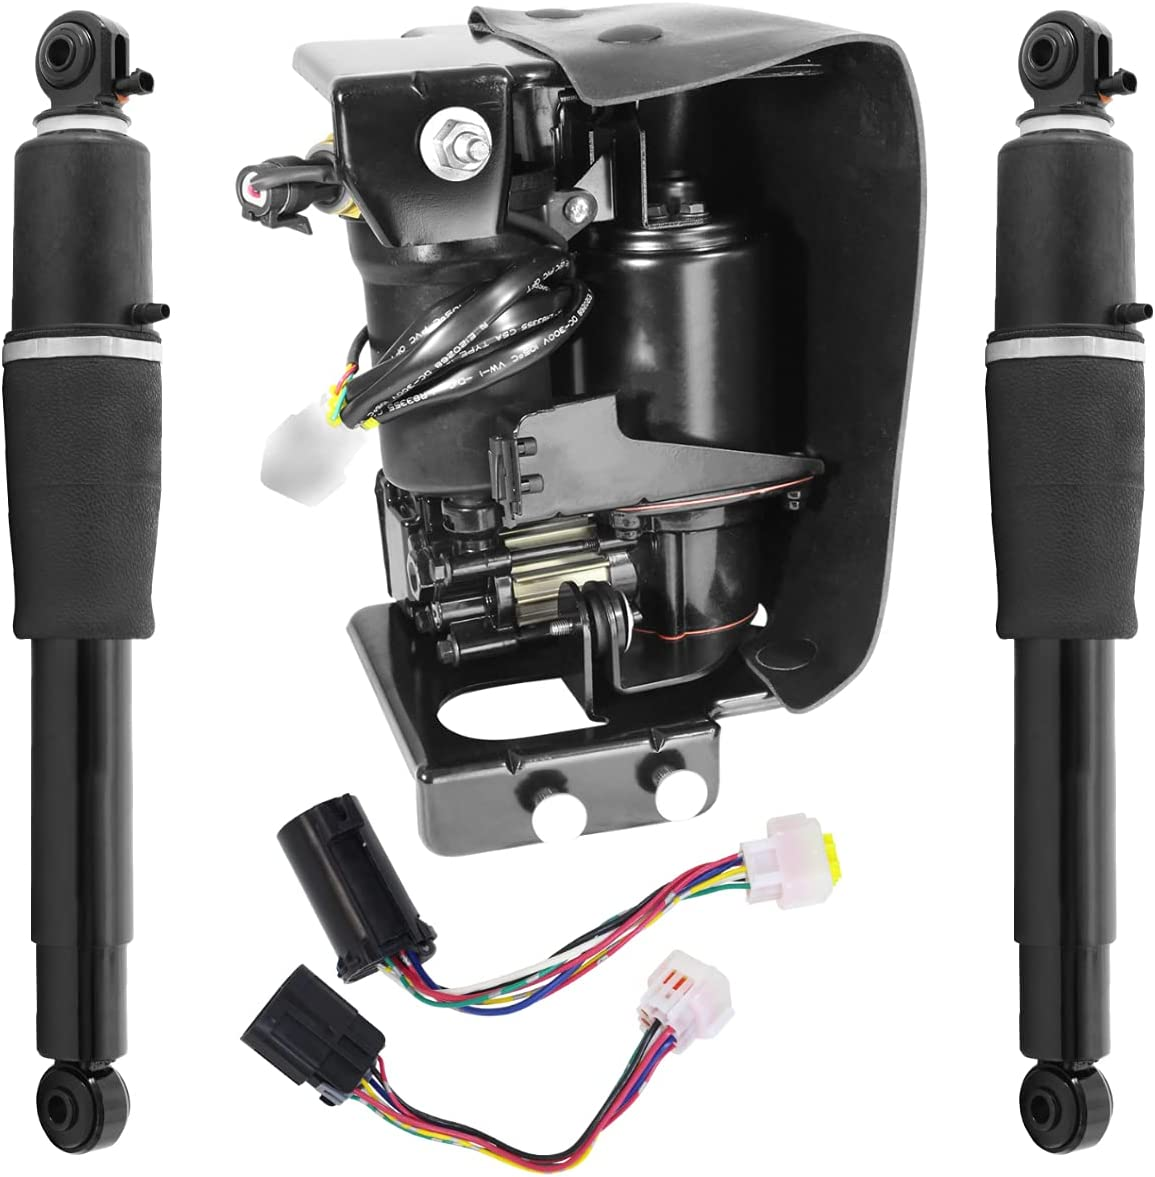 AutoShack SUSPPK0221 Air Ride OFFicial and Suspension Compressor Max 84% OFF Stru